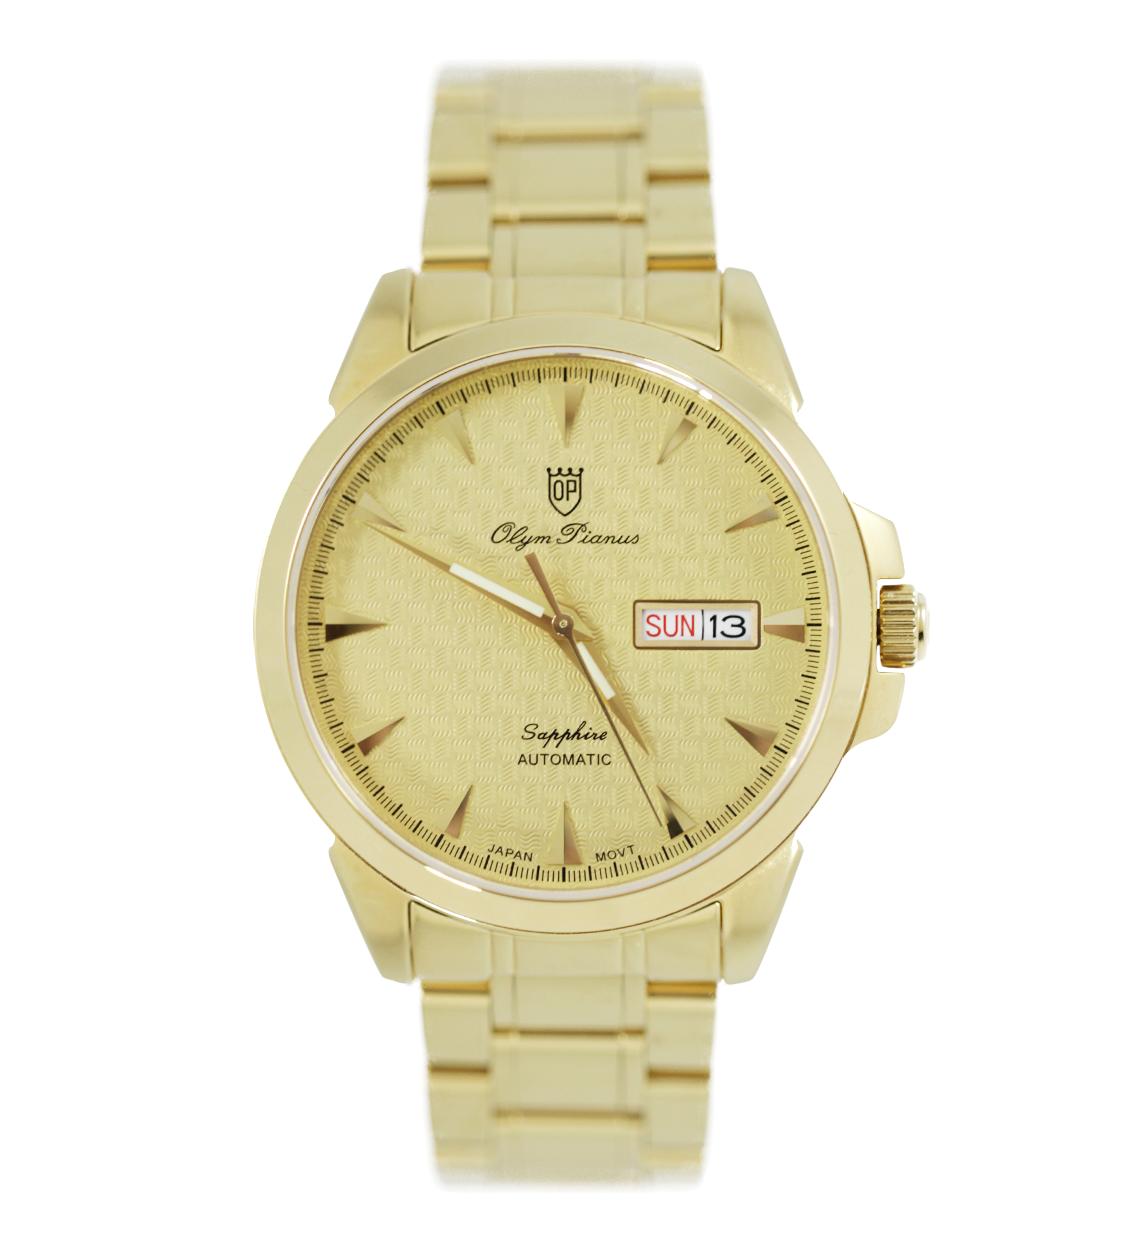 Đồng hồ nam OLYM PIANUS 990-08AMK-V